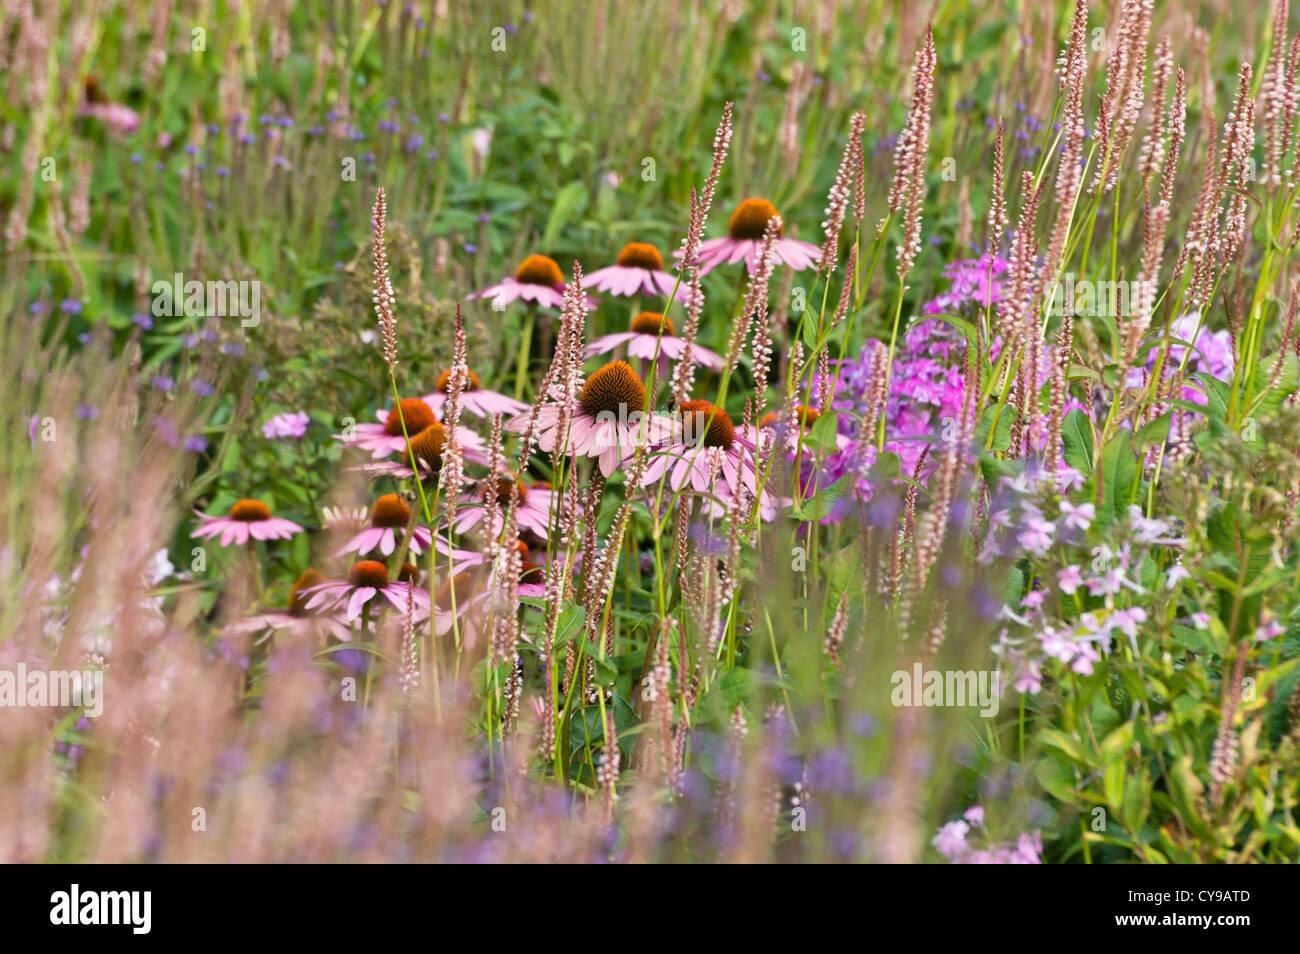 Purple cone flower (Echinacea purpurea 'Rubinstern') and mountain fleece (Bistorta amplexicaulis 'Rosea' - Stock Image